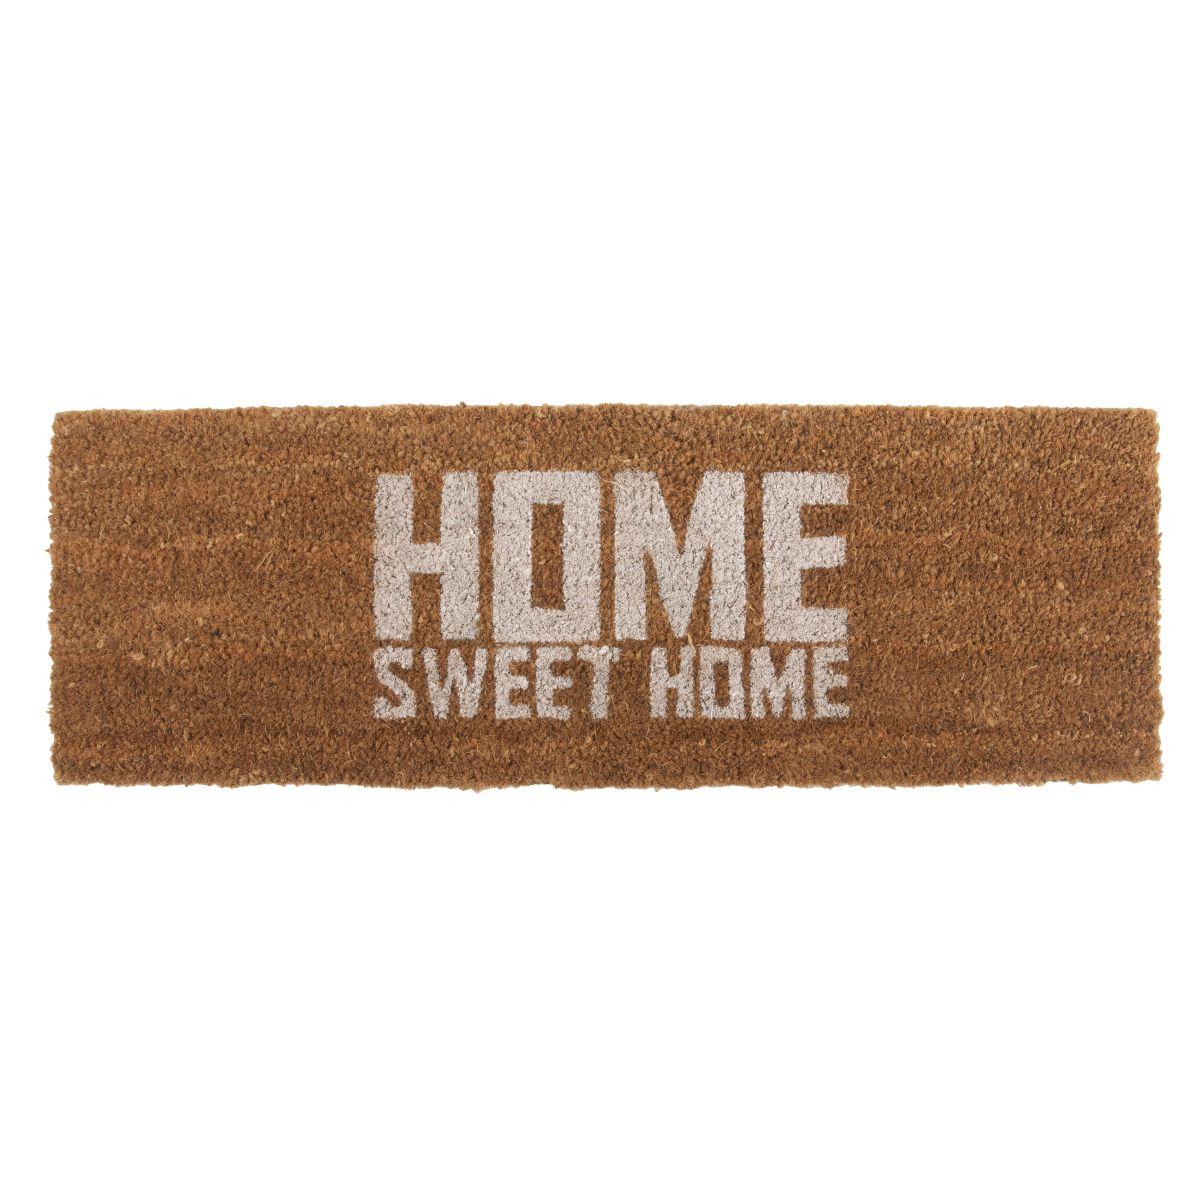 Elegant Fußmatte Beige Beste Wahl Kokos-fussmatte-home-sweet-home-natur-beige-schmale-